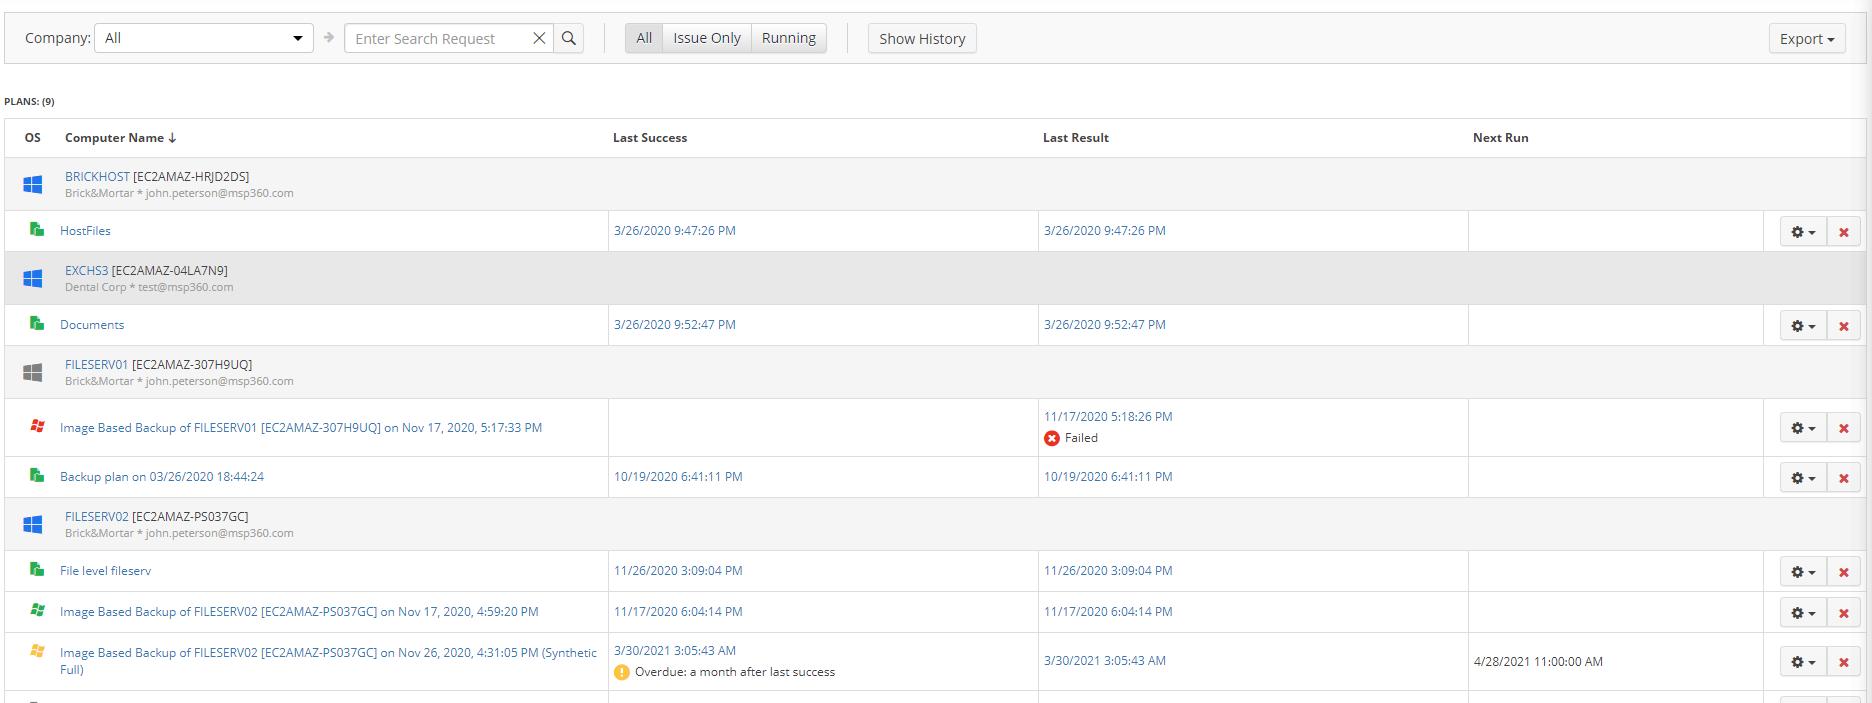 MSP360 Managed Backup: the Monitoring Tab